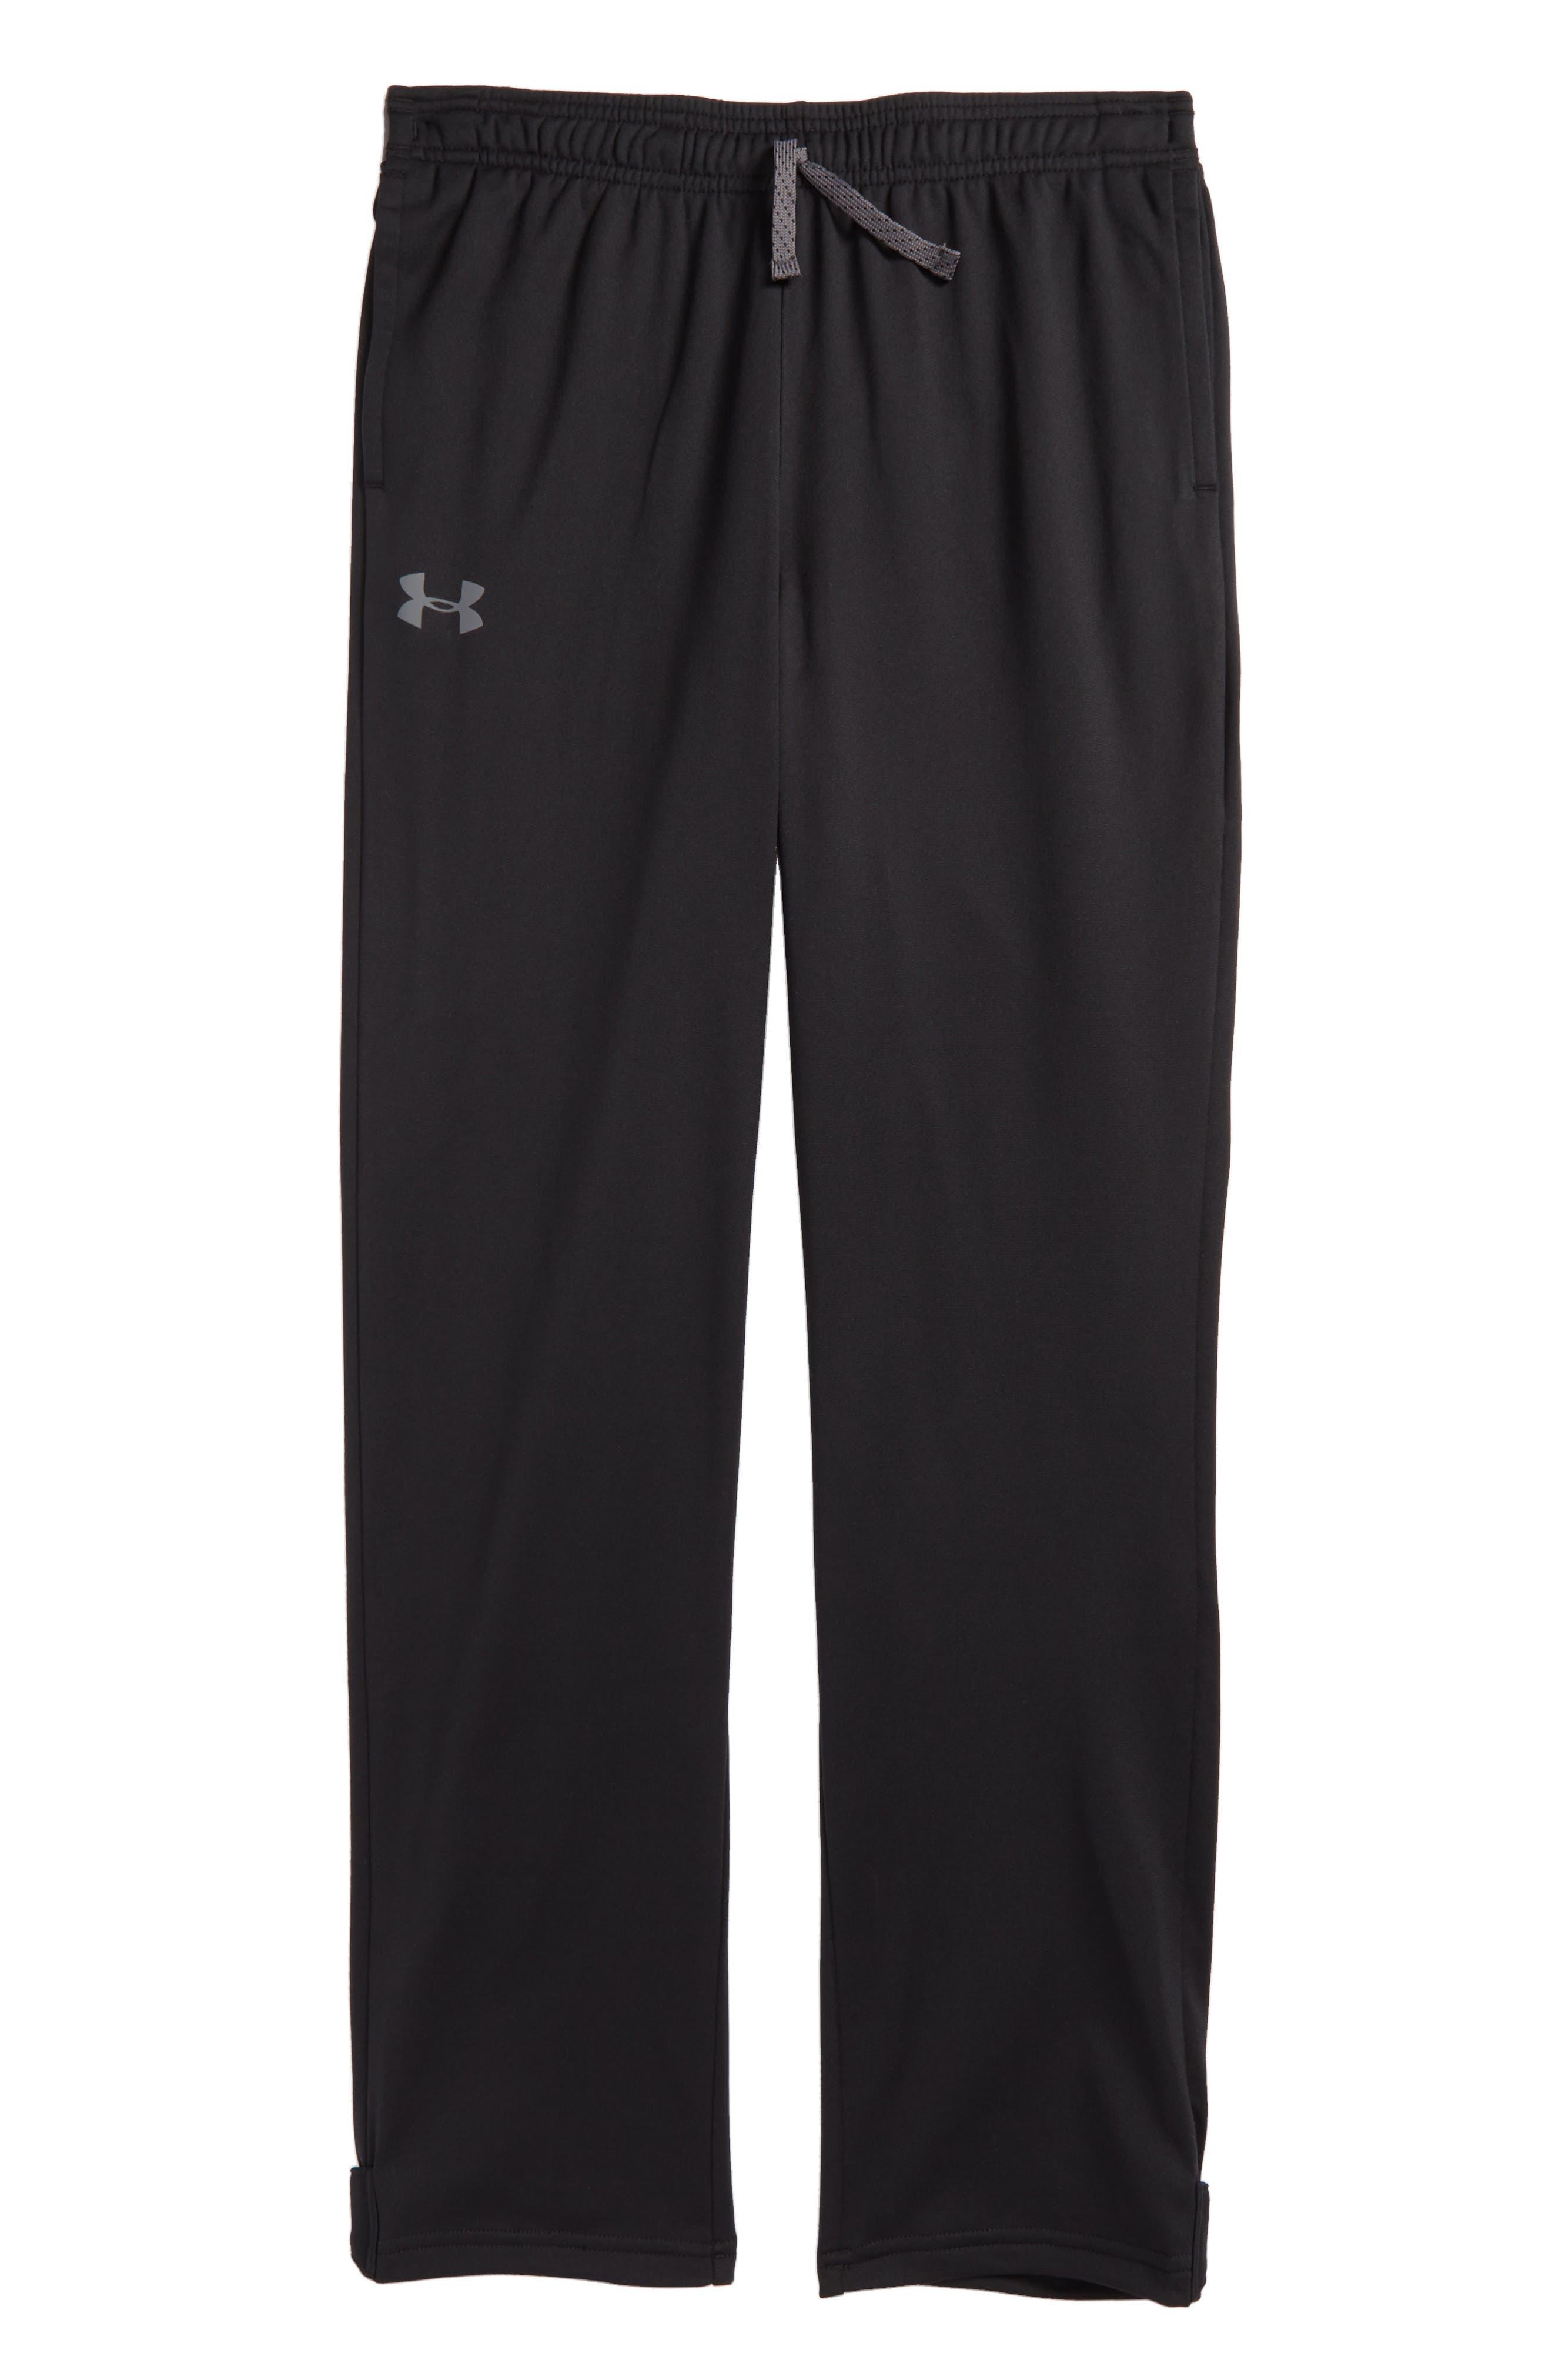 UNDER ARMOUR Brawler Slim Sweatpants, Main, color, 001